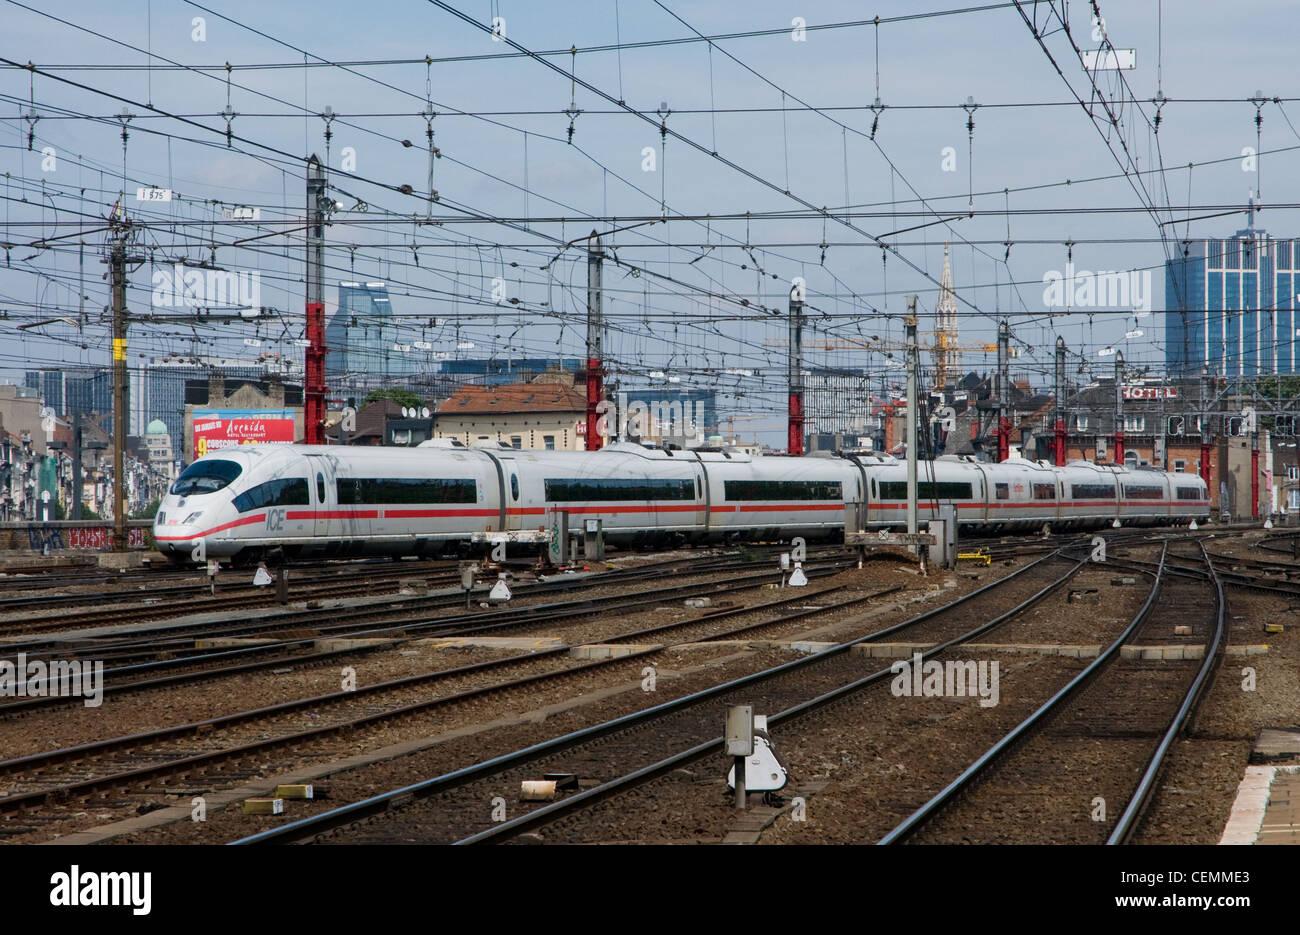 Deutsche Bahn ICE Zug Set, Brussel-Zuid, Belgien Stockbild